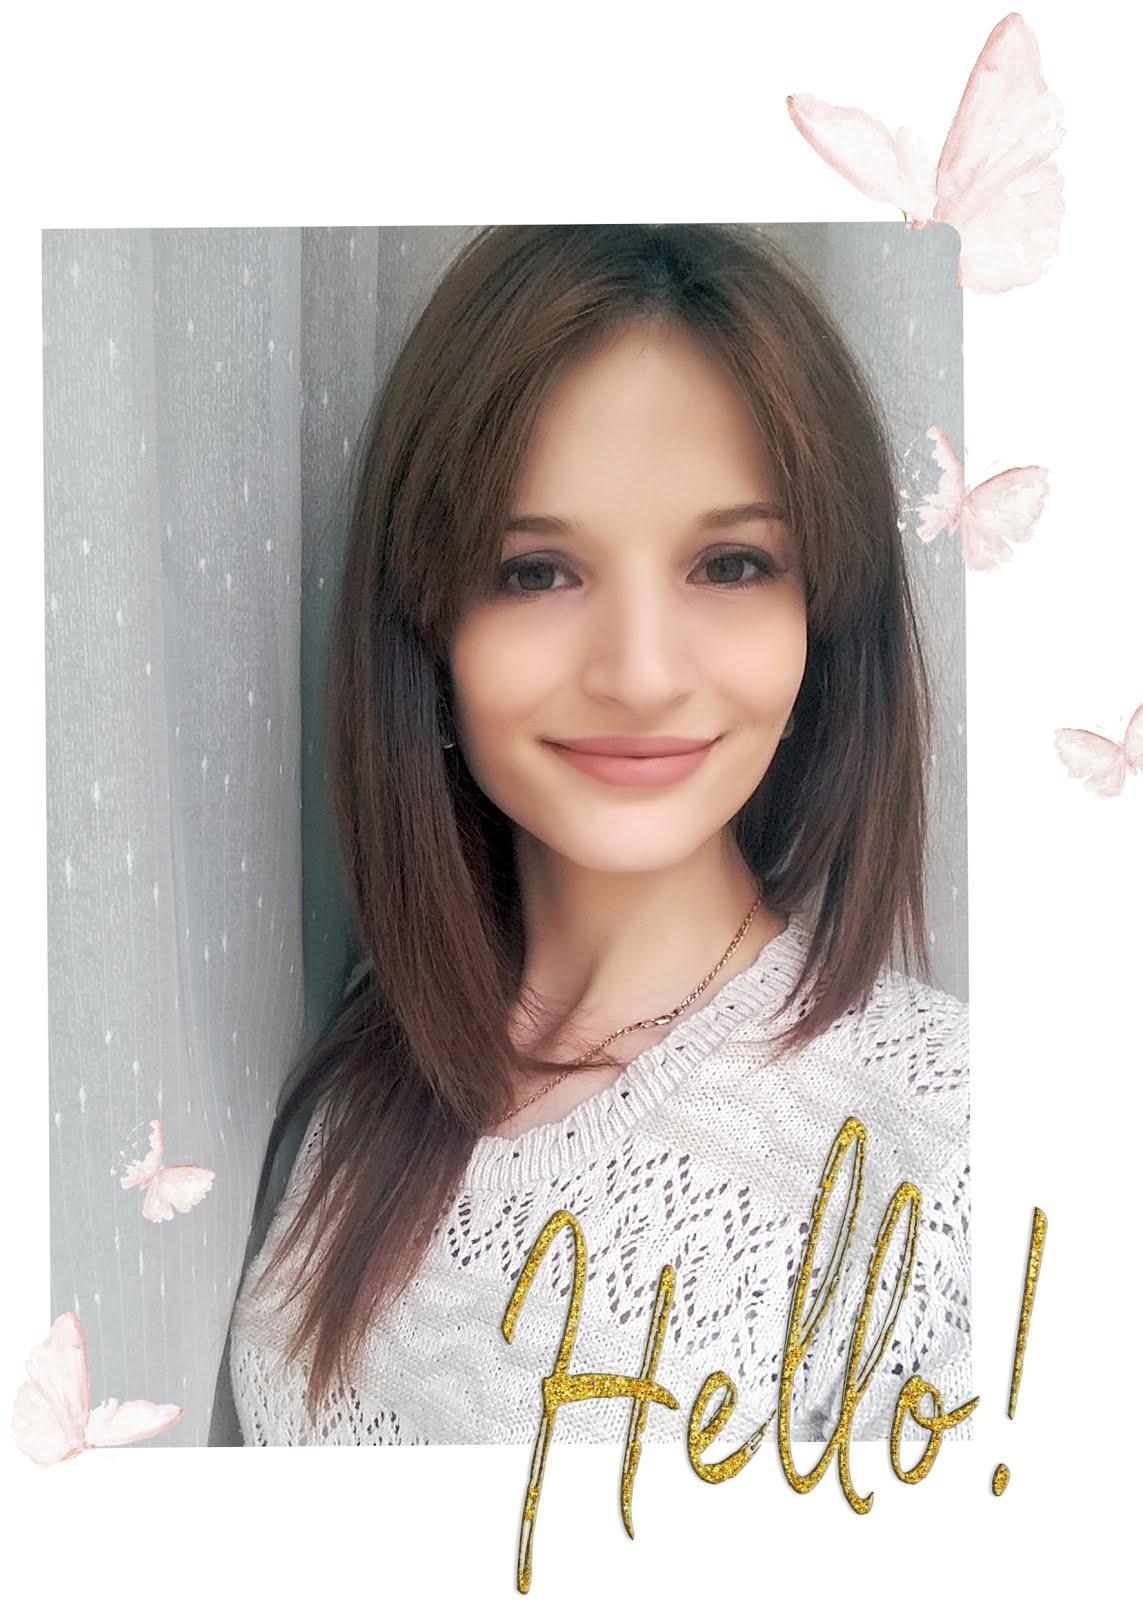 Kosareva Anna